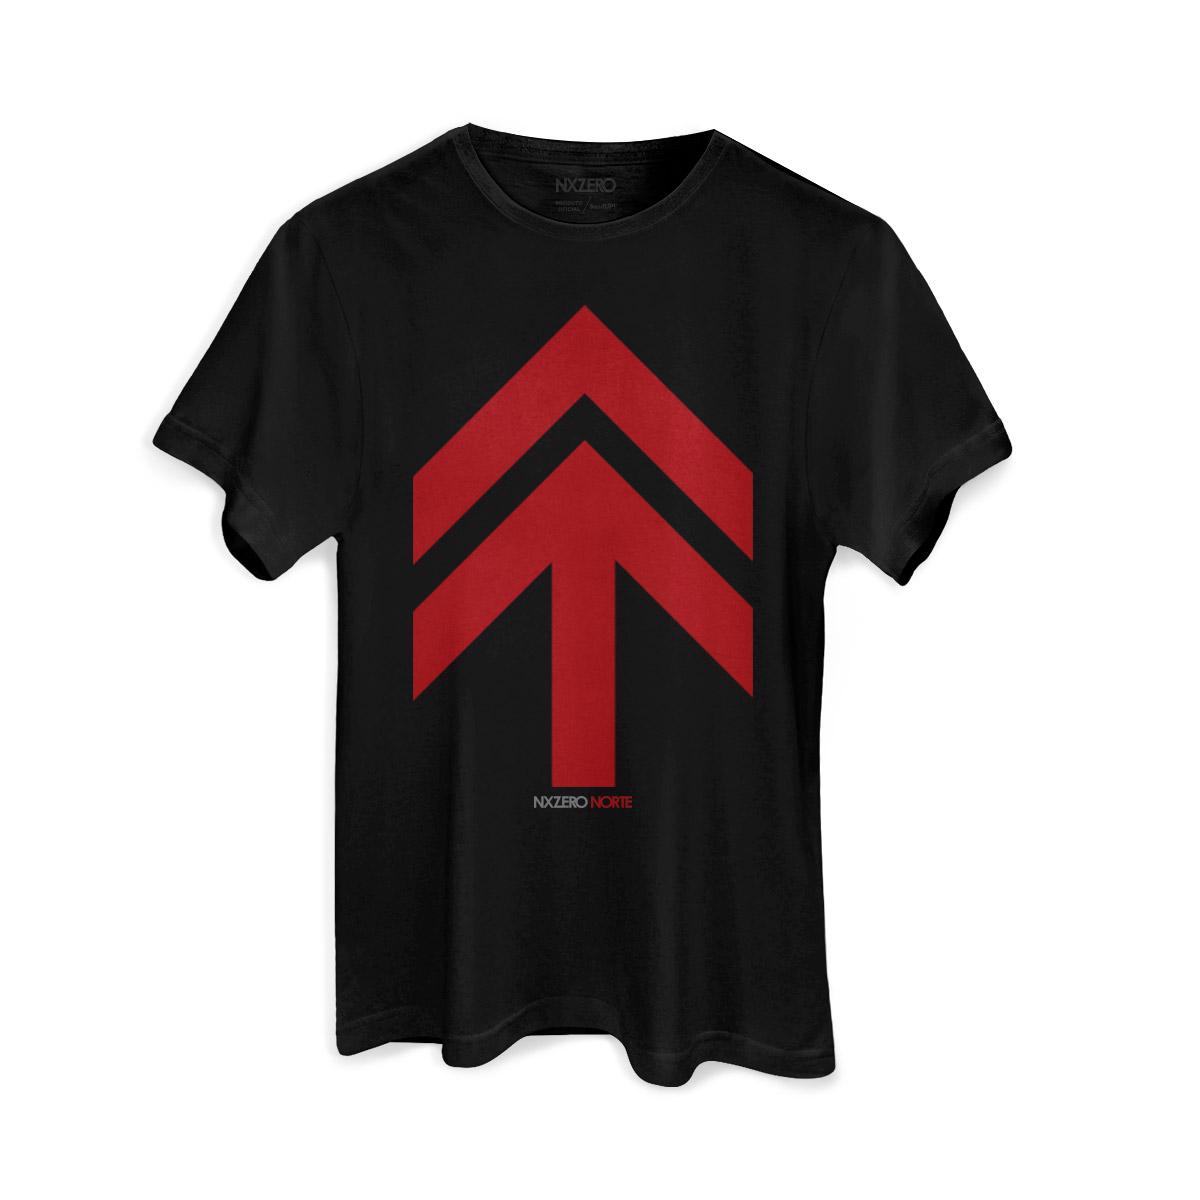 Camiseta Masculina NXZero Norte